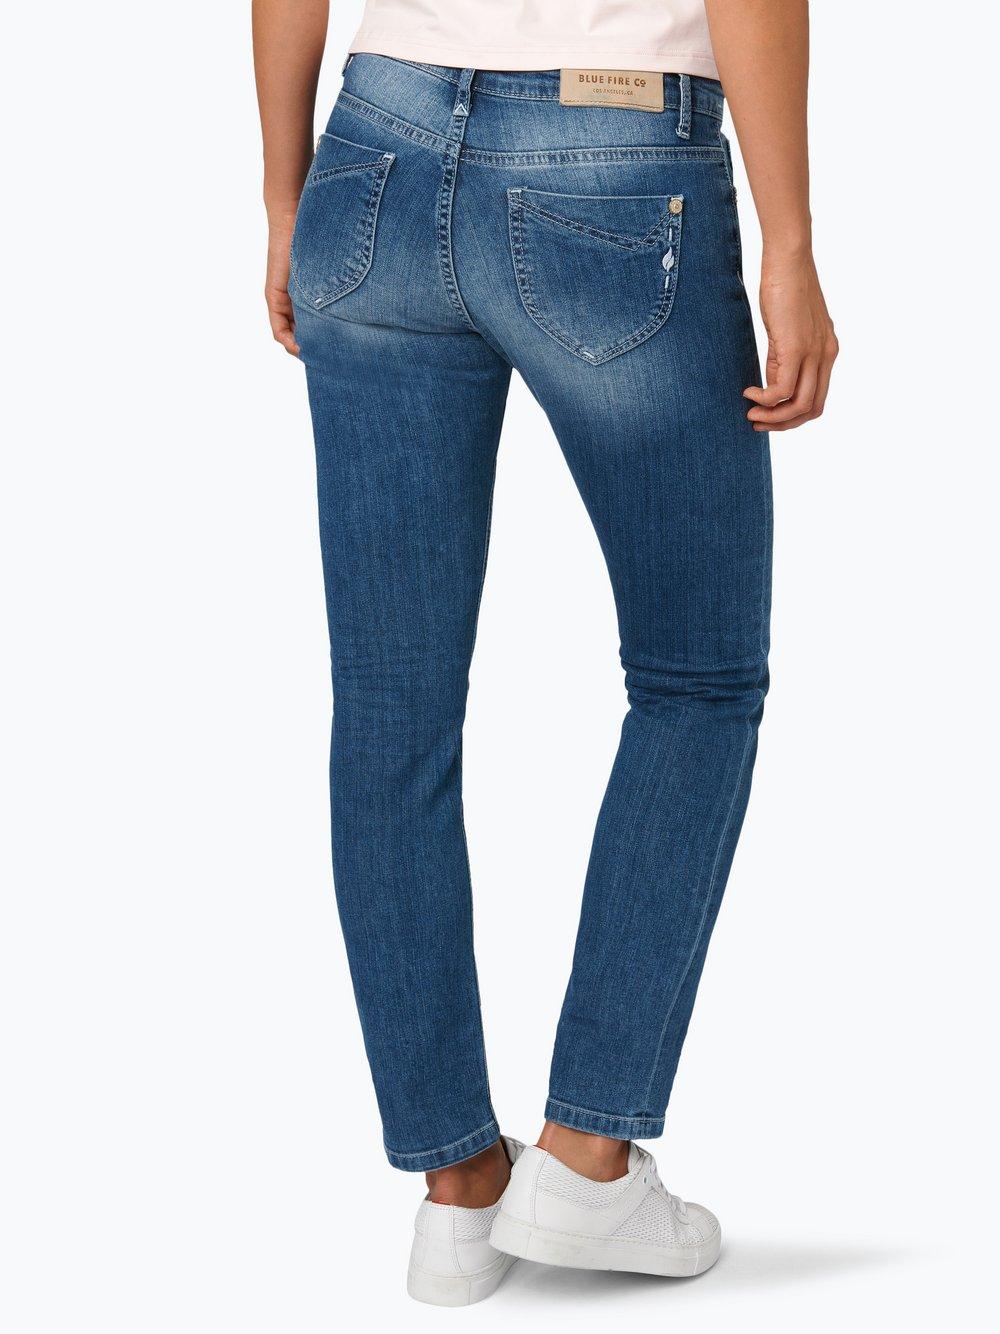 Damen Jeans schwarz Blue Fire Bester Online-Verkauf eq4s0GXXey